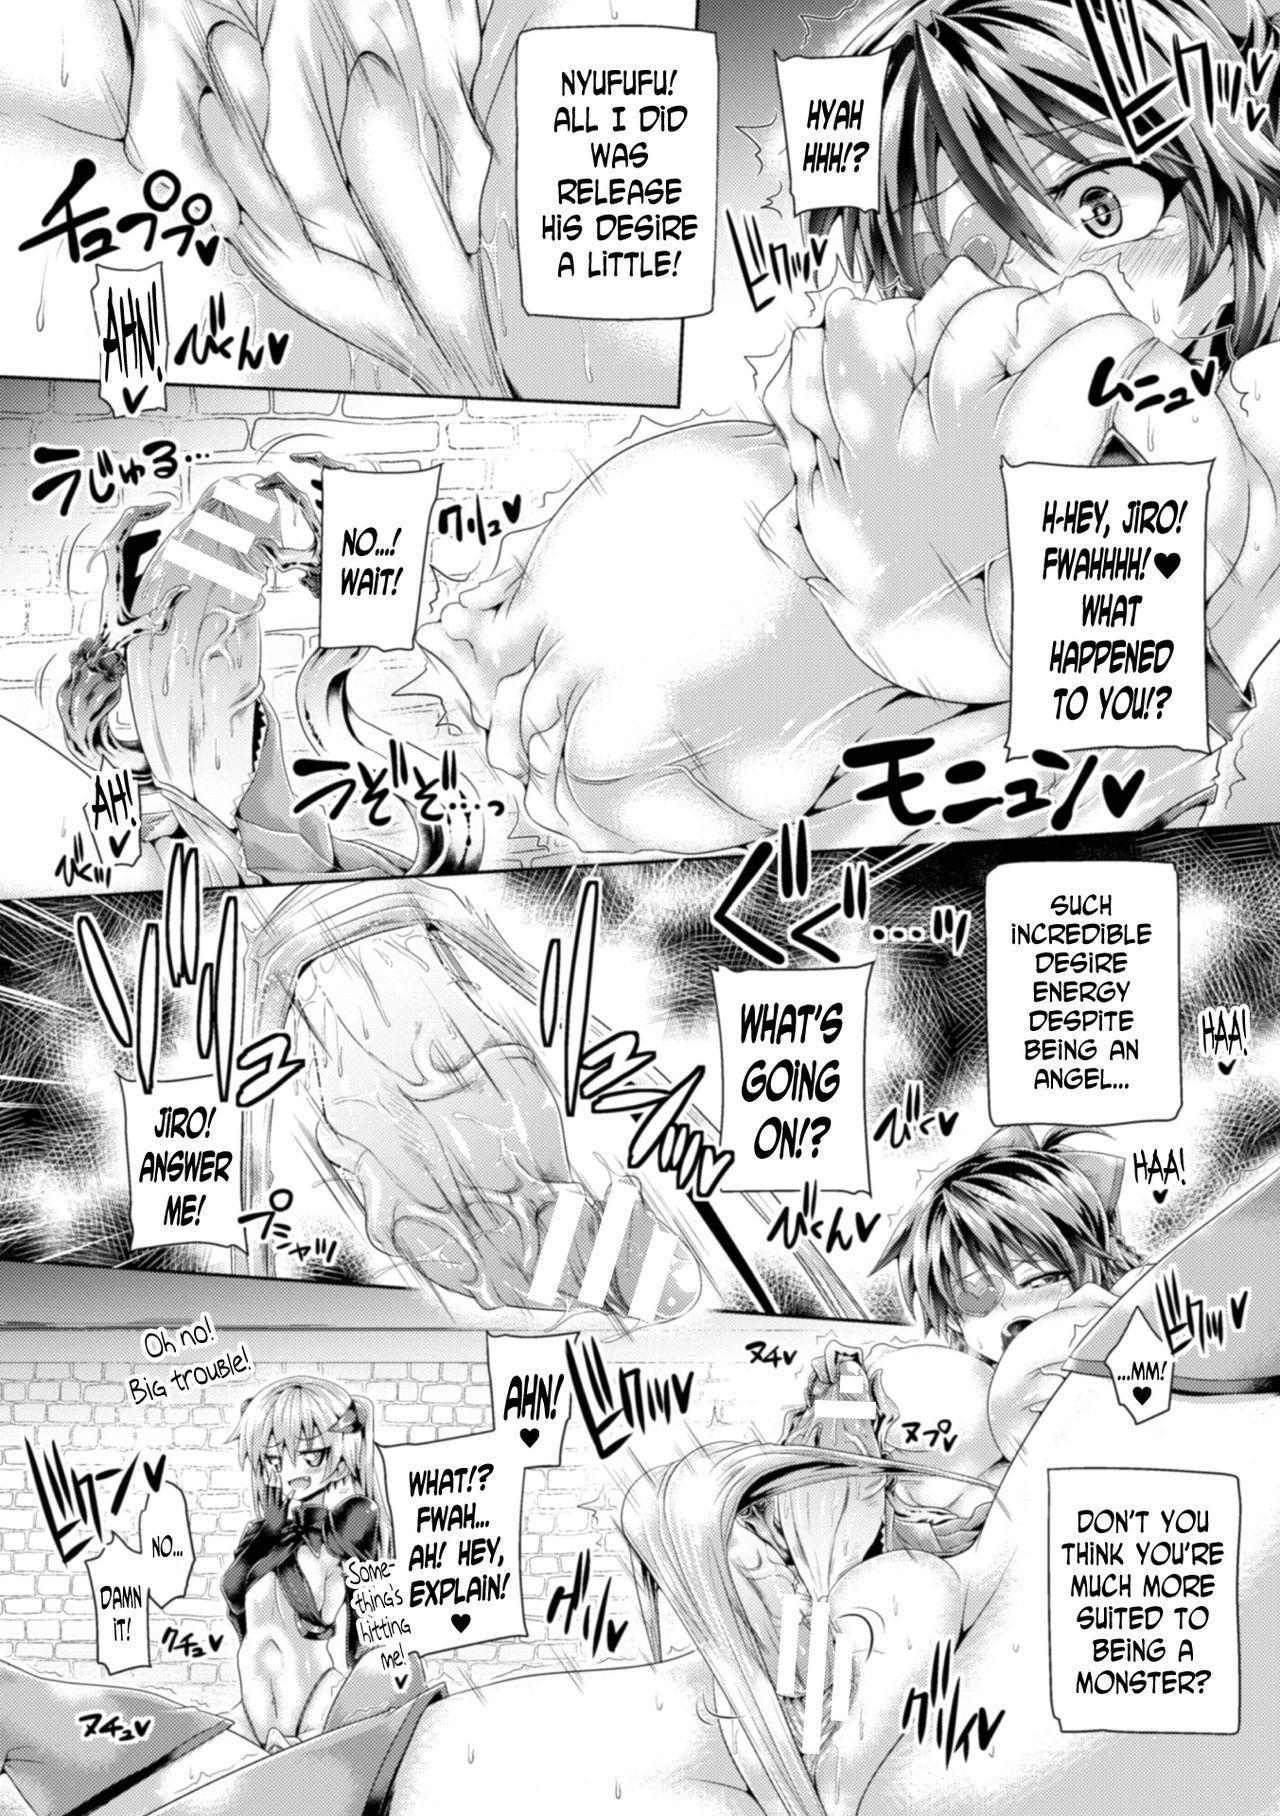 [Anthology] 2D Comic Magazine Tenshi ni Ochiru Akuma-tachi Vol. 1 Ch. 1-3 [English] [N04h] [Digital] 35